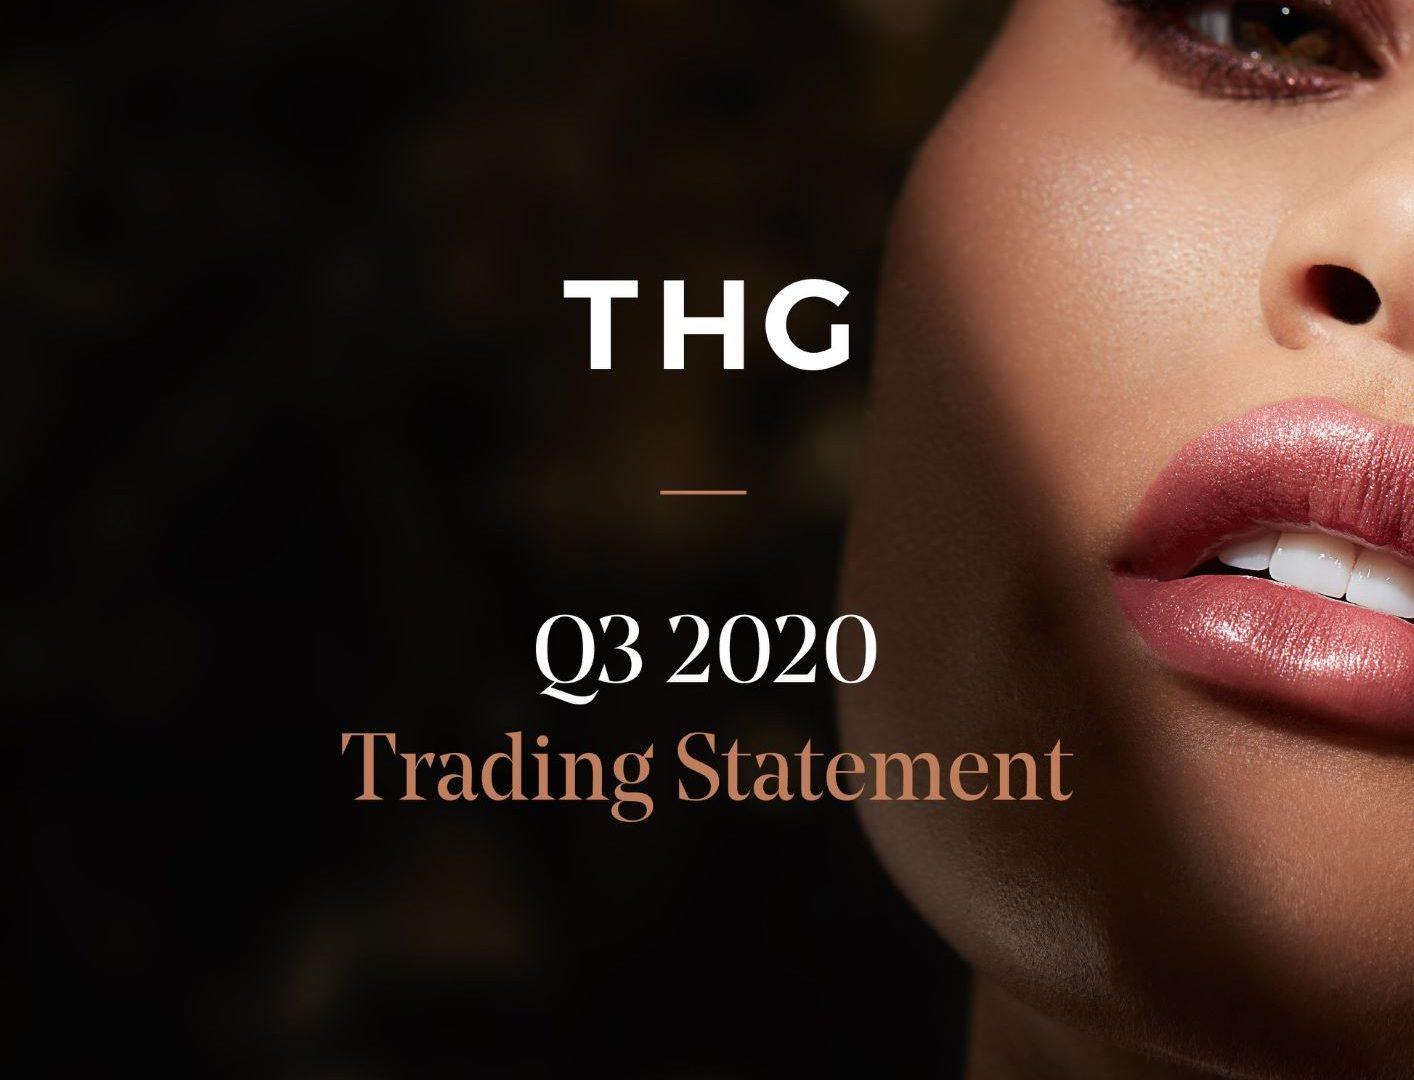 Q3 trading update thg image